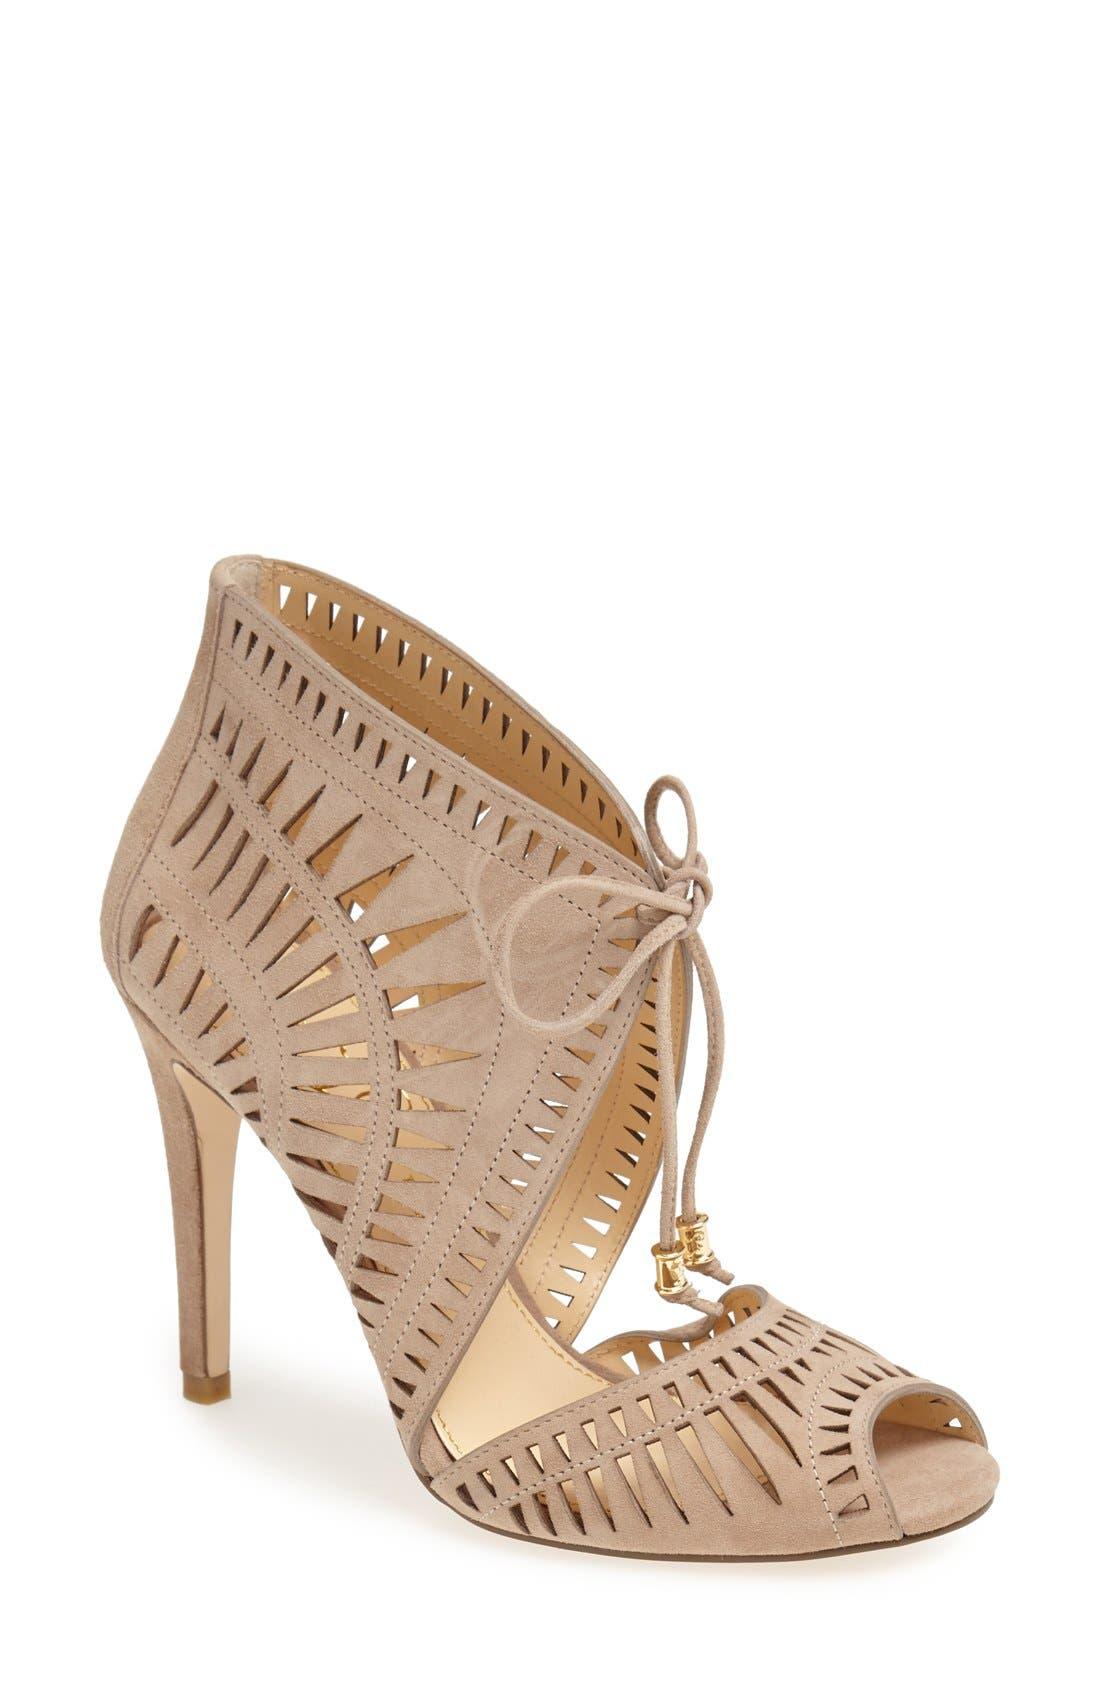 Main Image - Ivanka Trump 'Delfino' Sandal